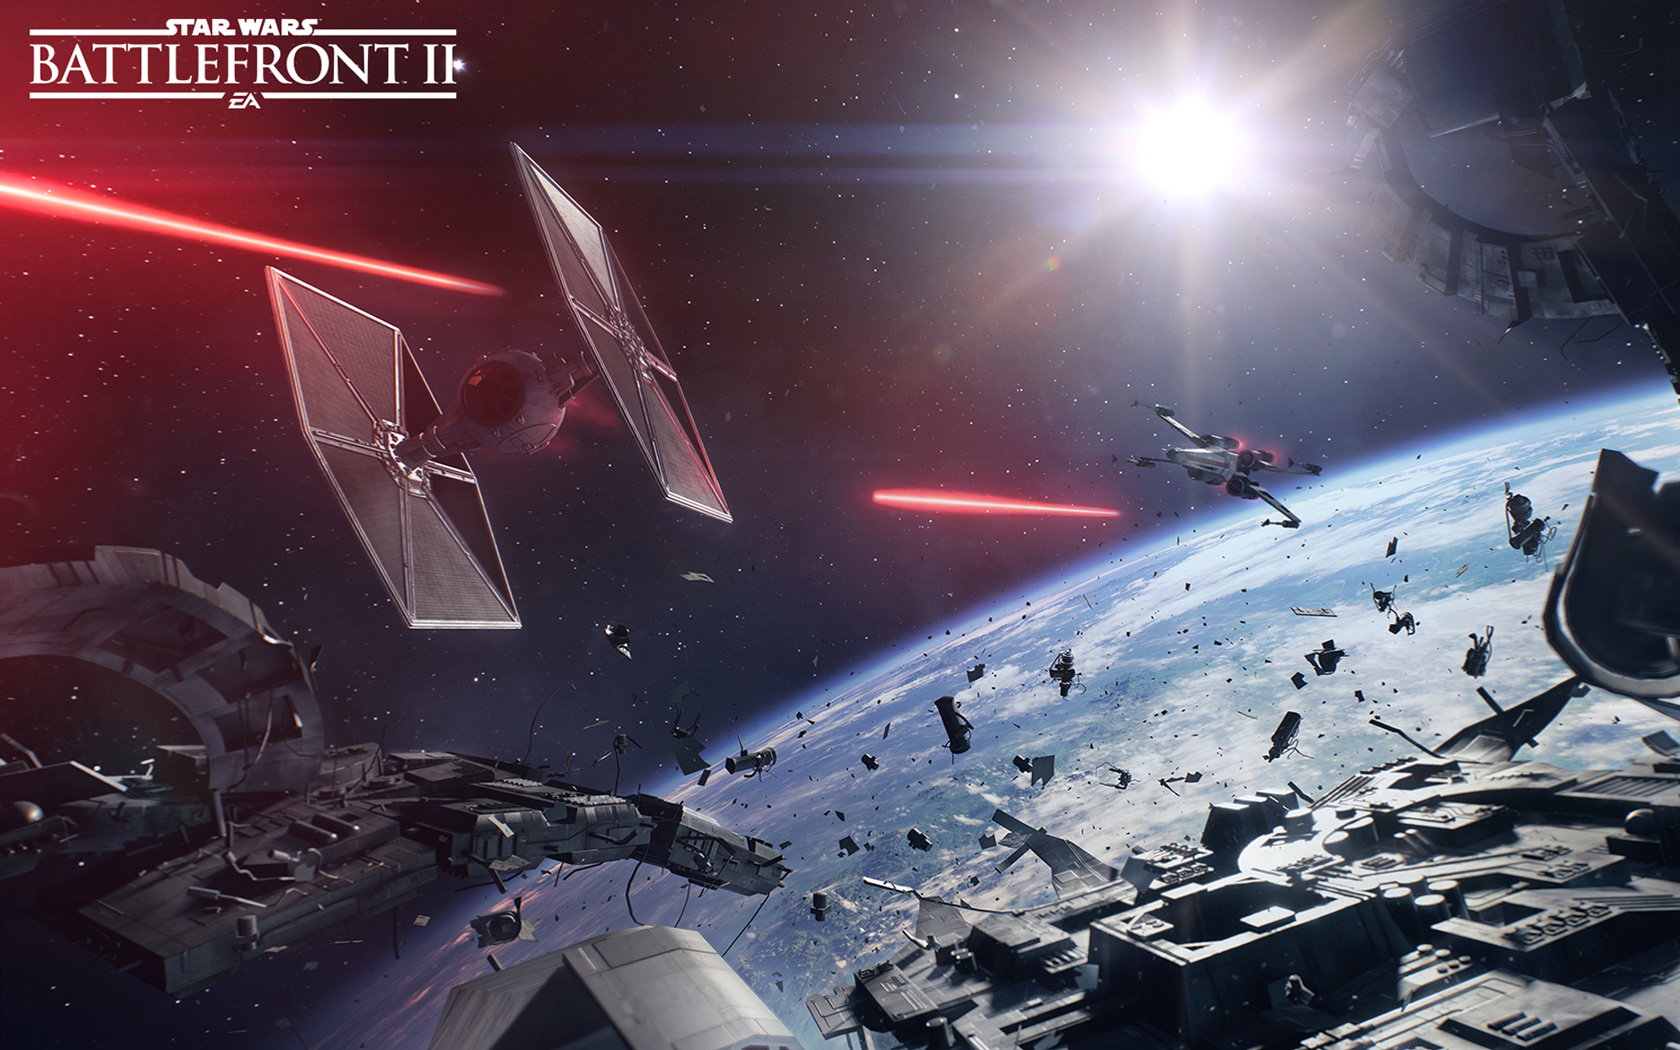 Star Wars: Battlefront II Wallpaper in 1680x1050